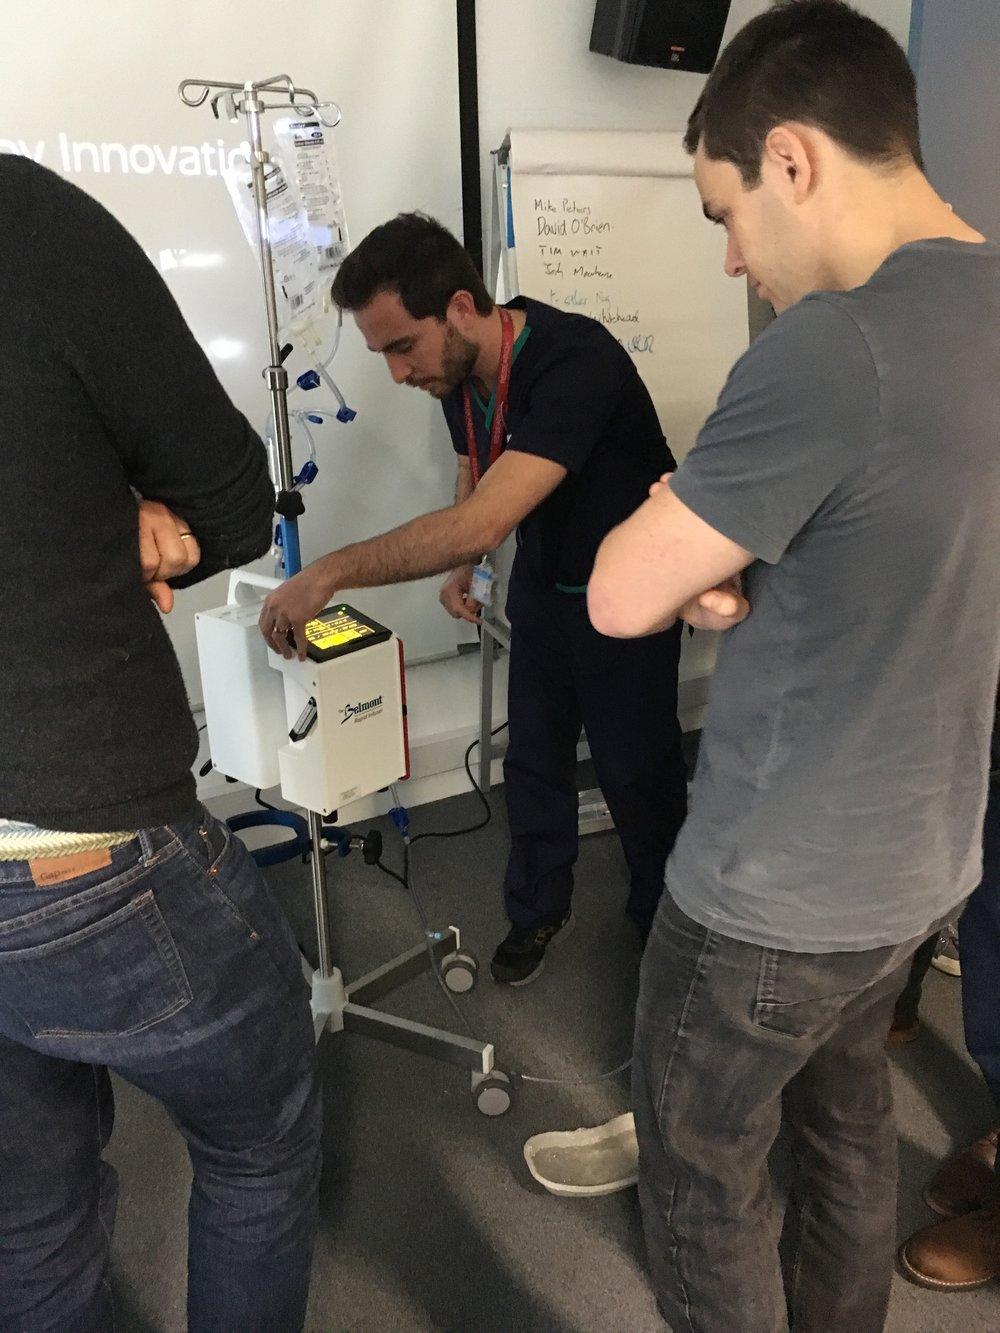 Belmont Rapid Infuser - Demonstration and problem solving